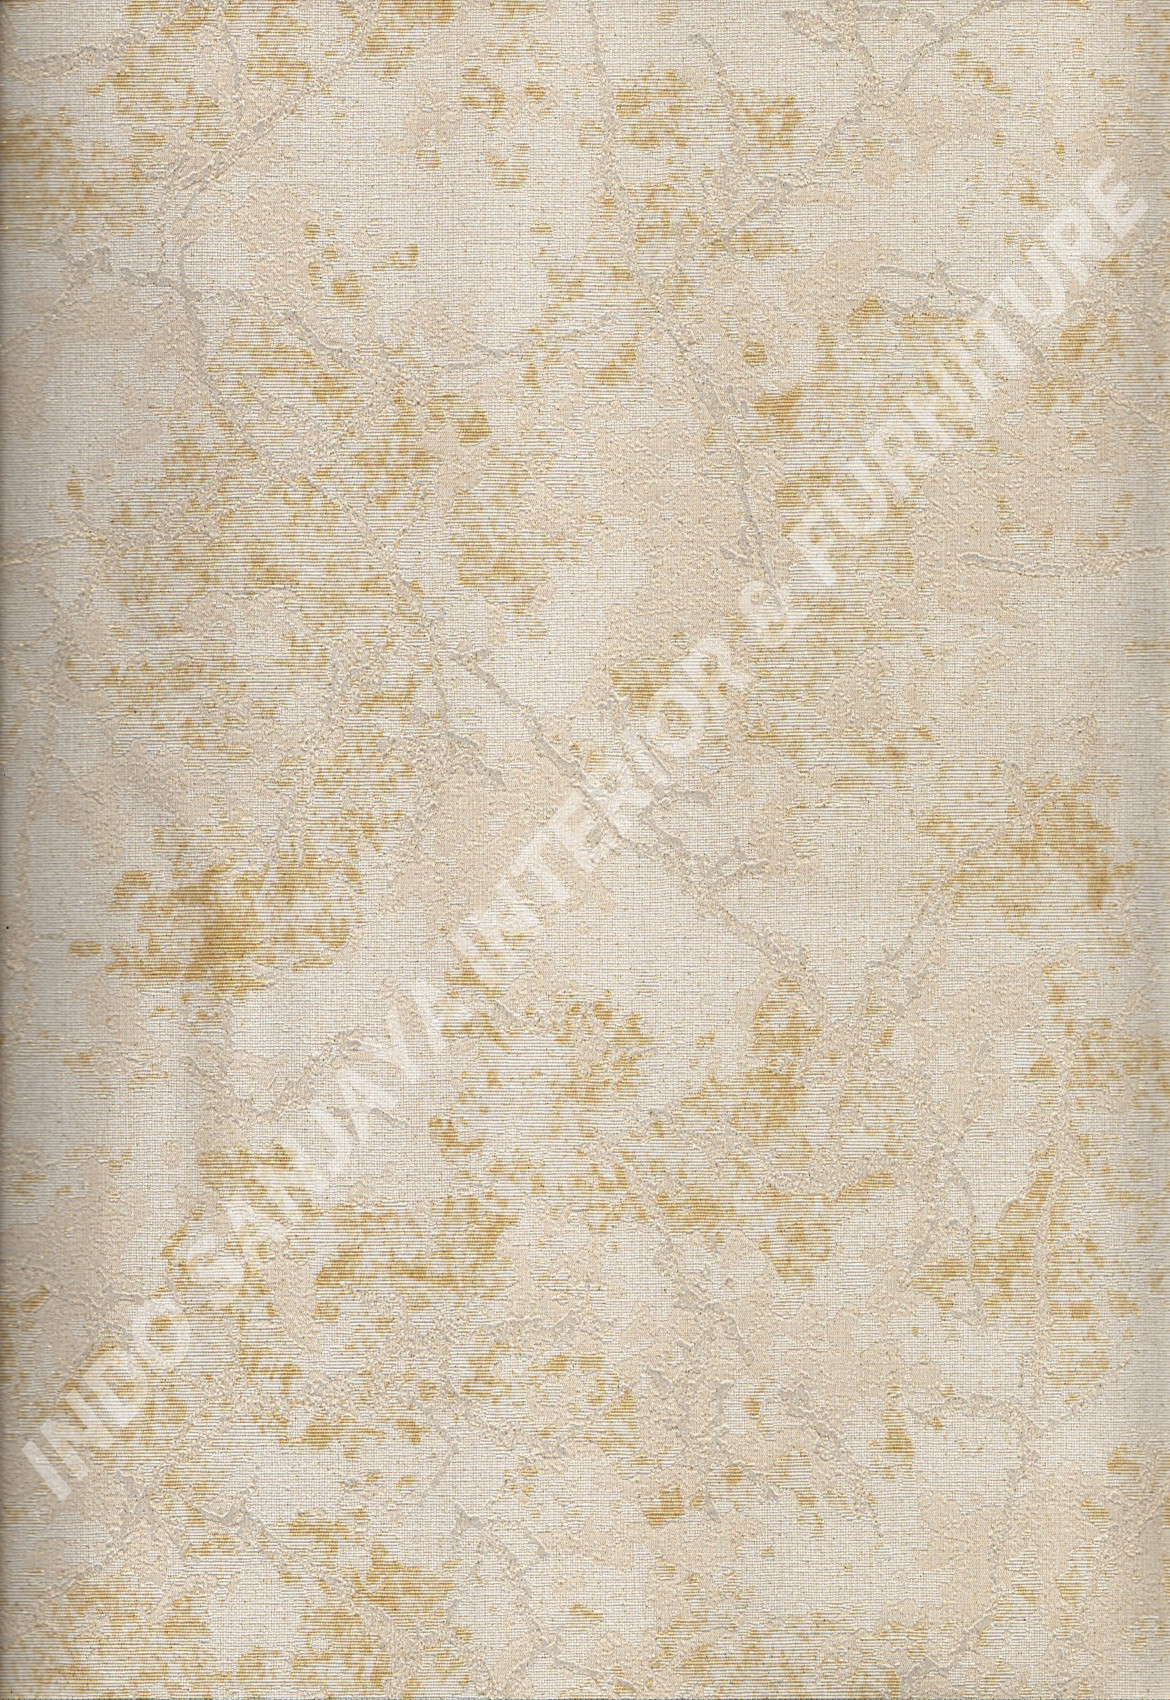 wallpaper   Wallpaper Minimalis Polos 81224-3:81224-3 corak  warna